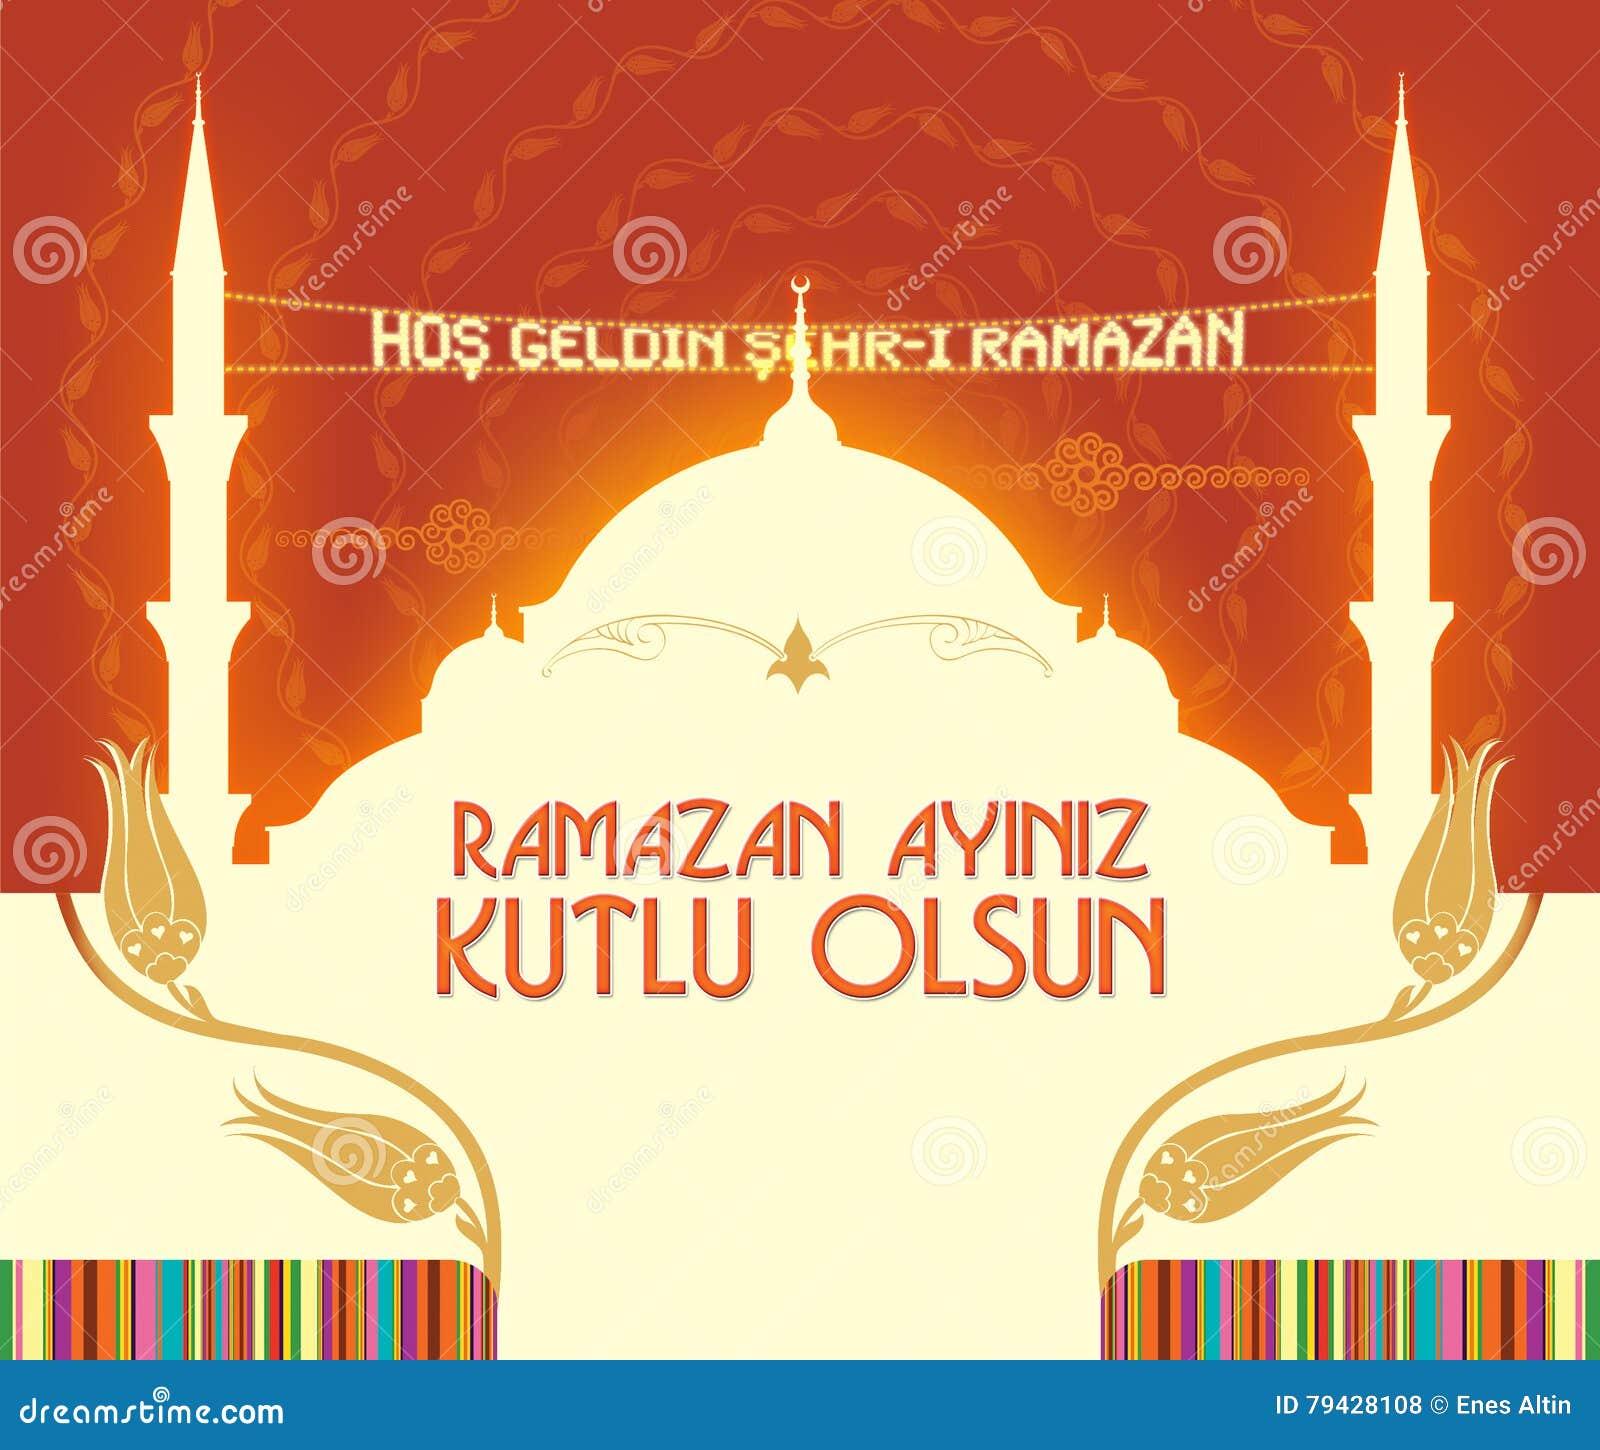 Ramadan greeting postcard english translate happy ramadan stock ramadan greeting postcard english translate happy ramadan kristyandbryce Image collections